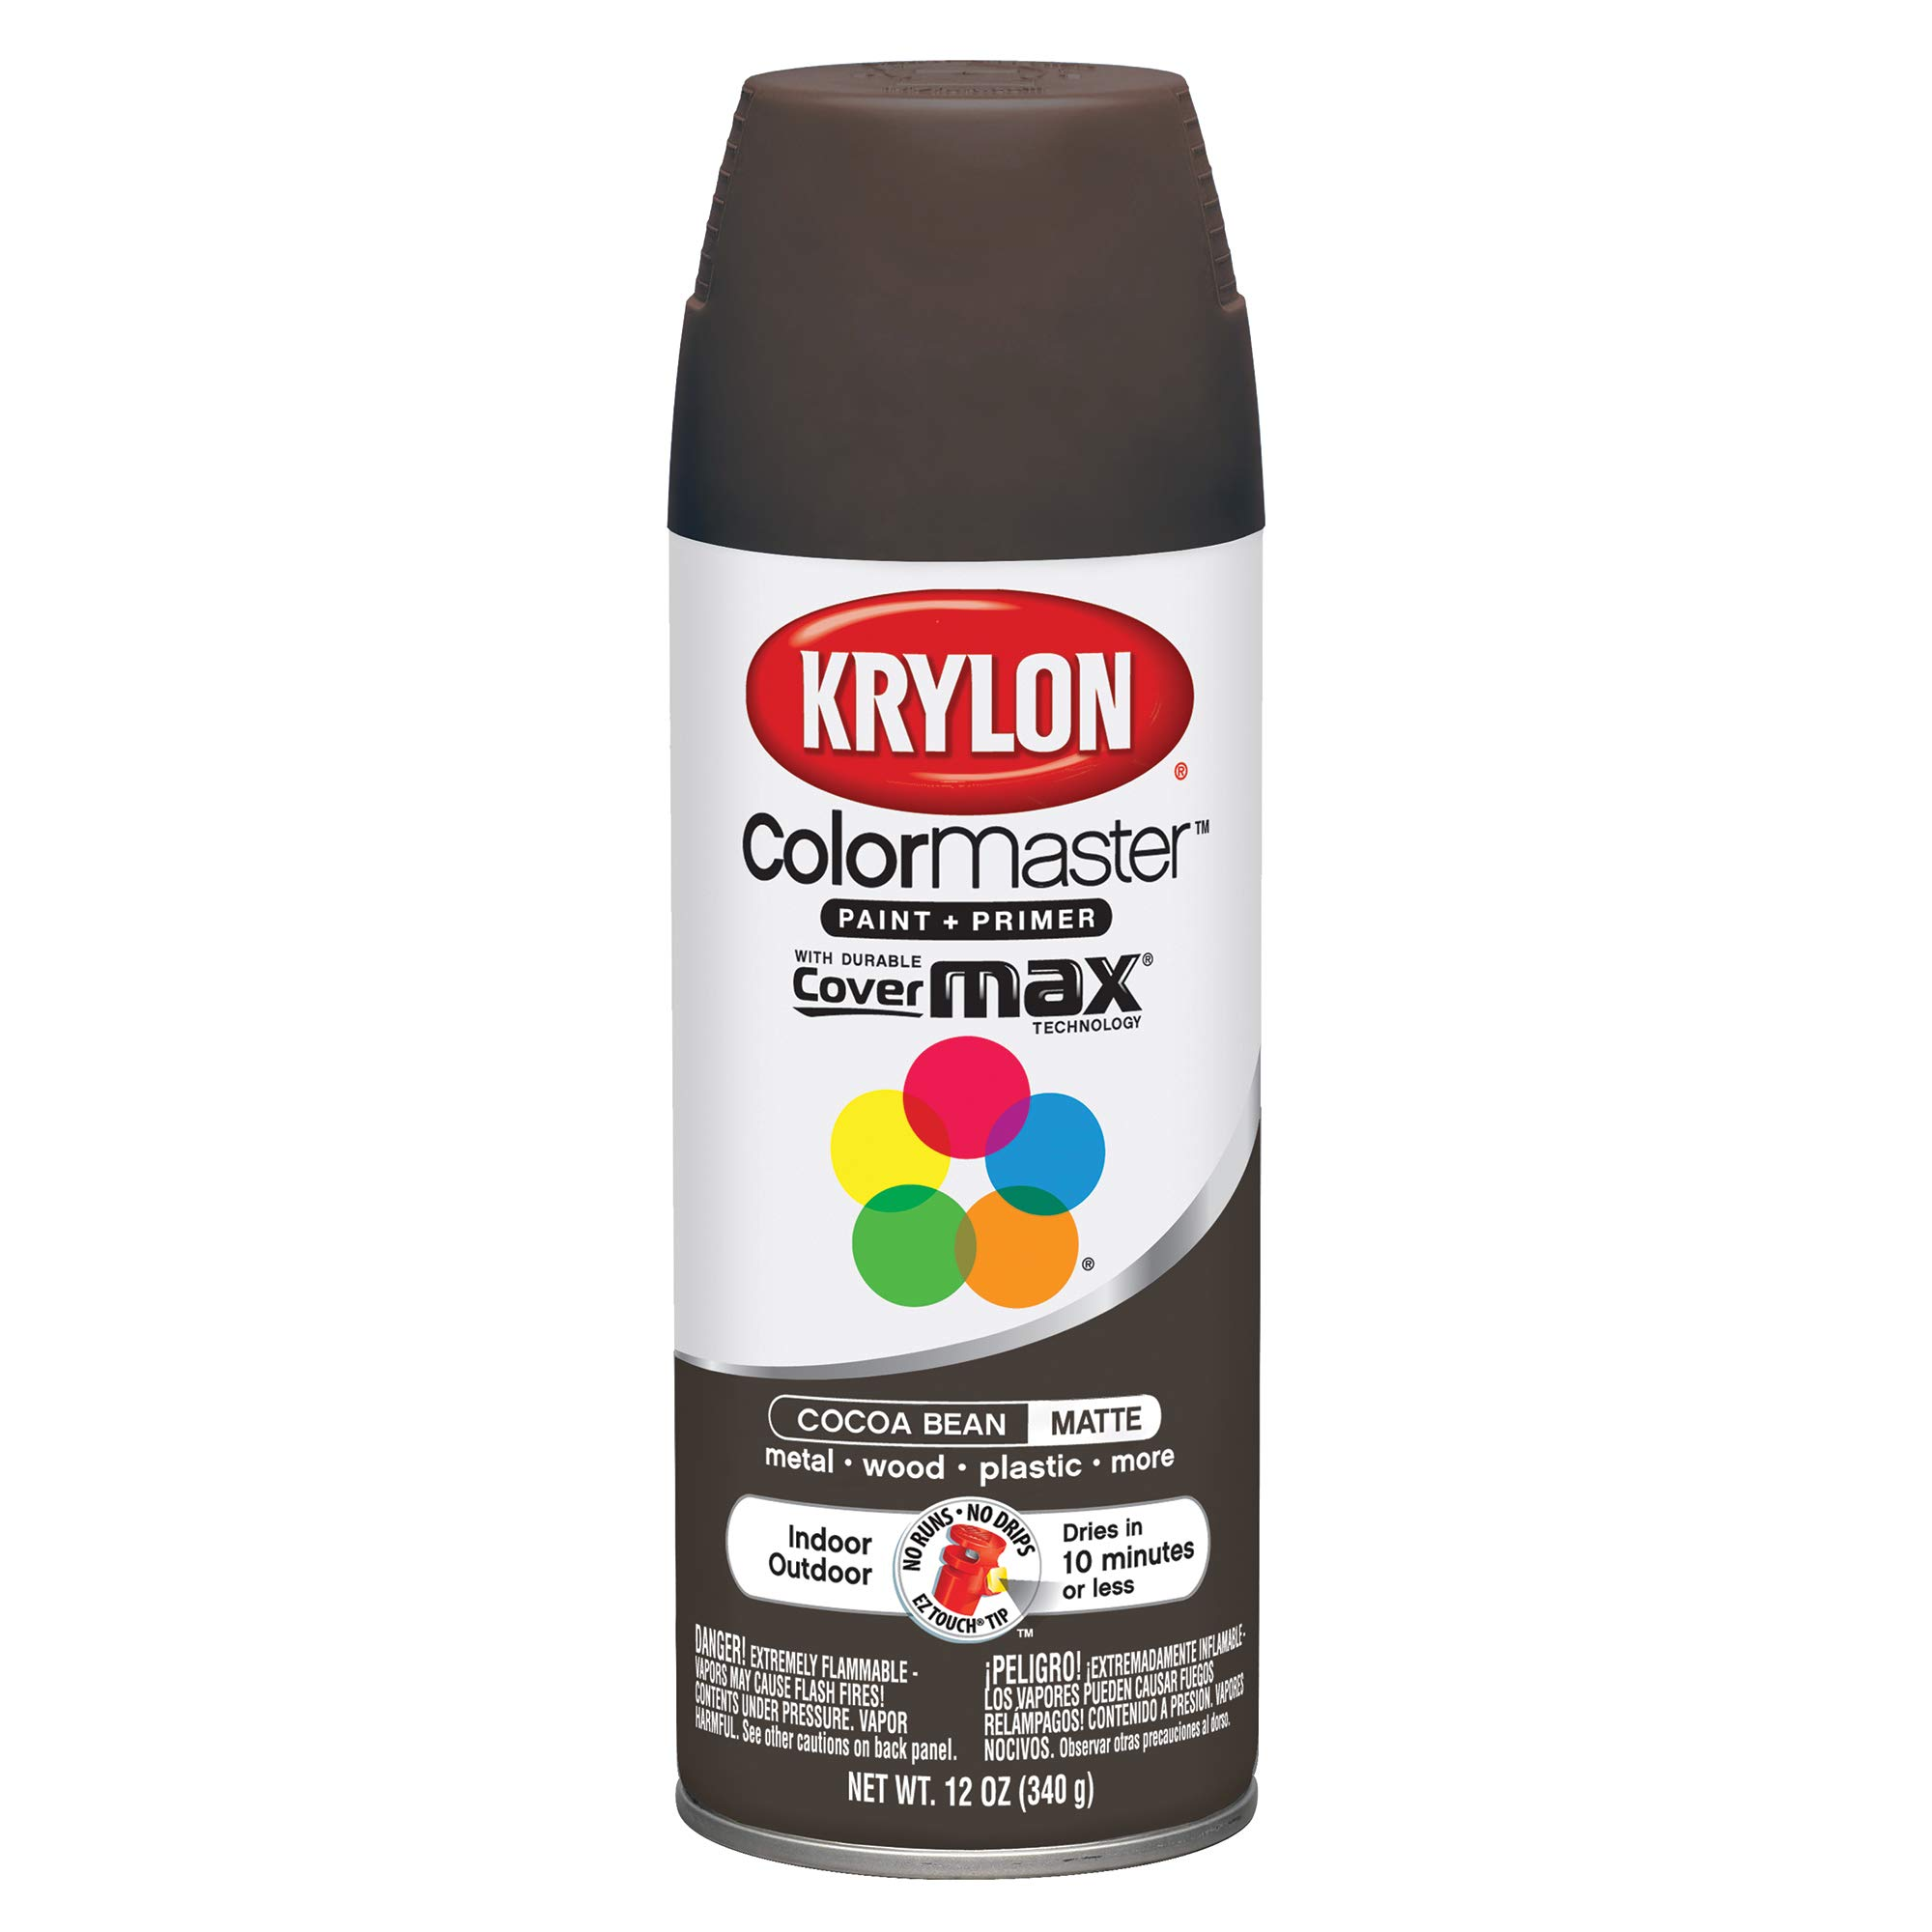 Krylon K05359102 ColorMaster Primer Aerosol Paints Cocoa Bean by Krylon (Image #1)